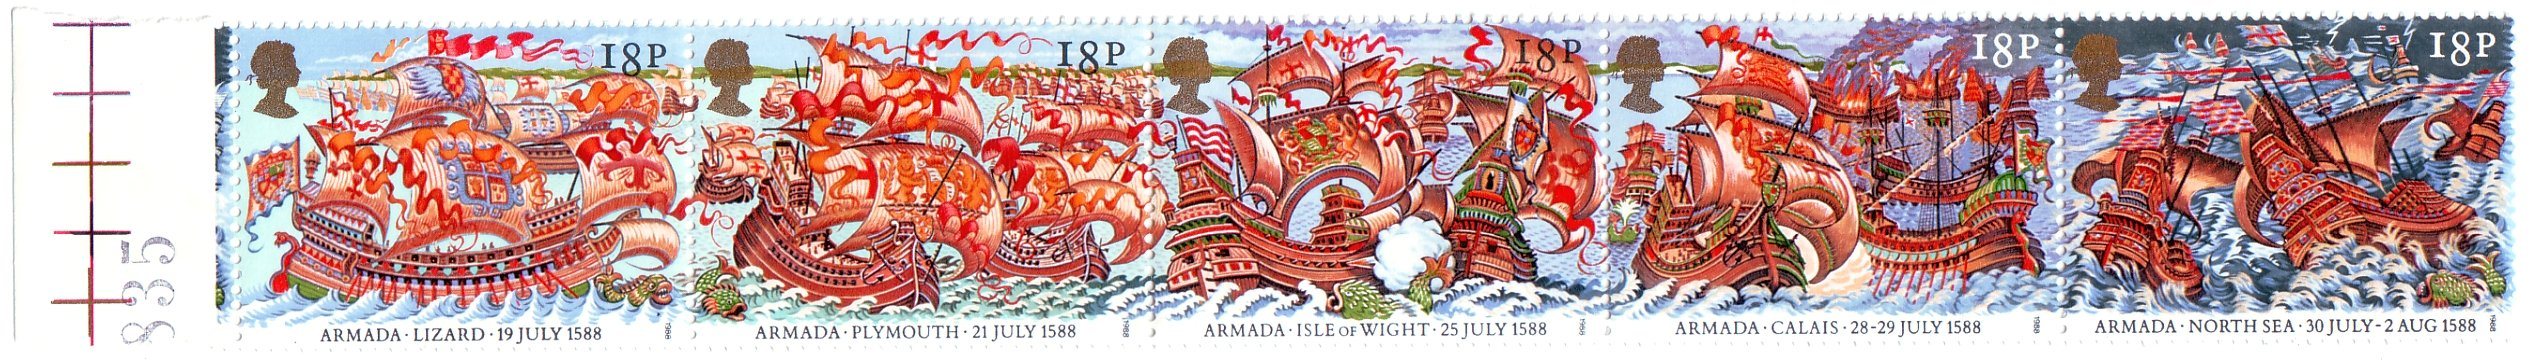 Spanish Armada 400th Anniversary Postage Stamps -1988